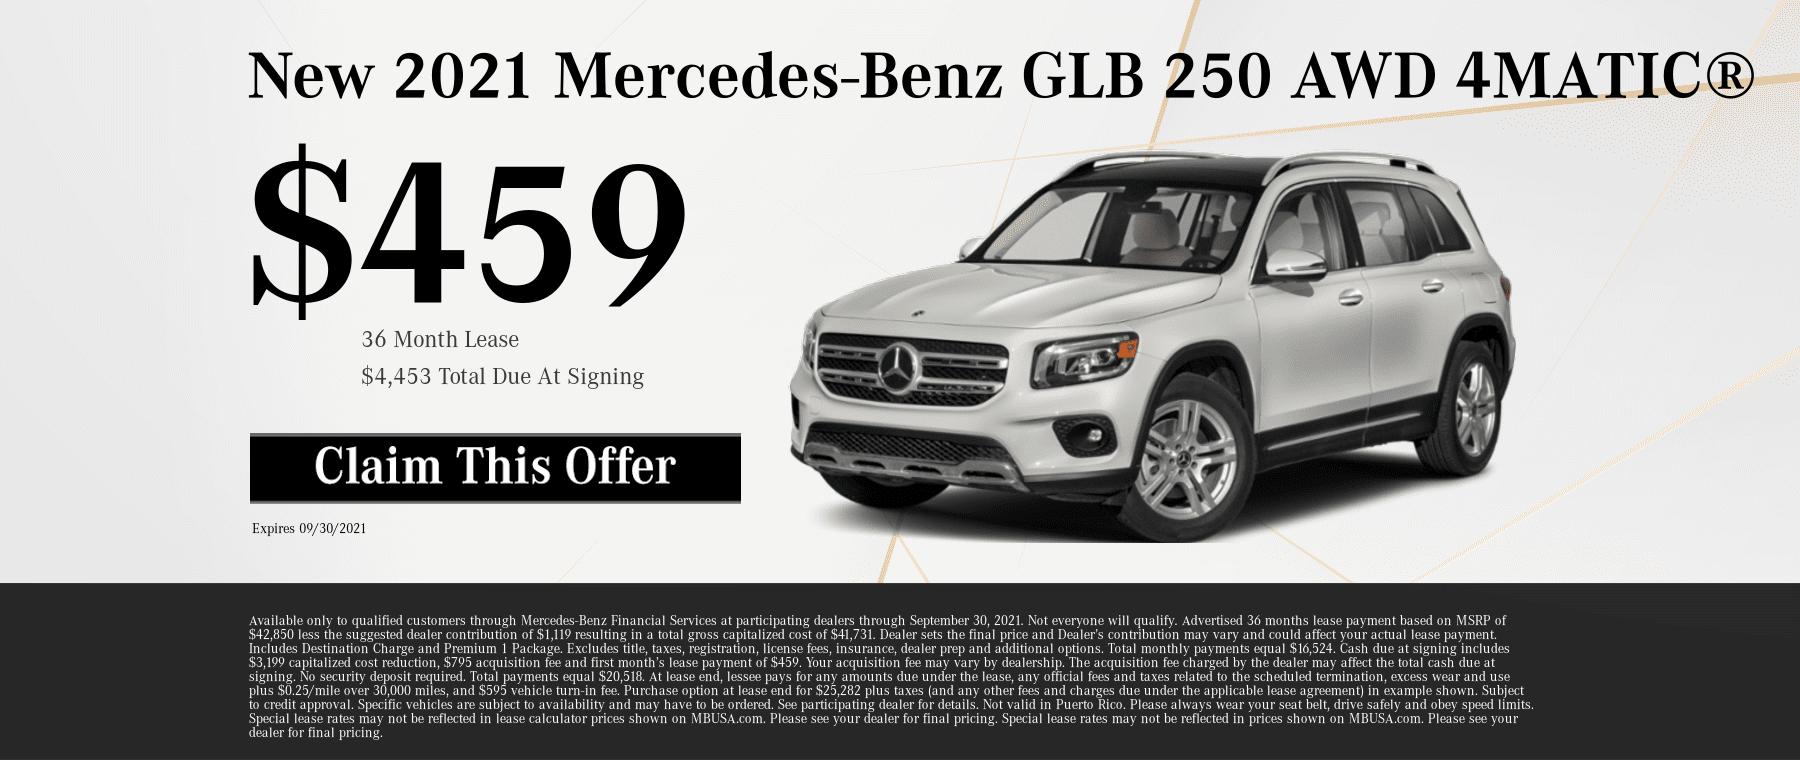 2021-Mercedes-Benz-GLB-250-AWD-4MATIC®-GLB-250-AWD-4MATIC®-30